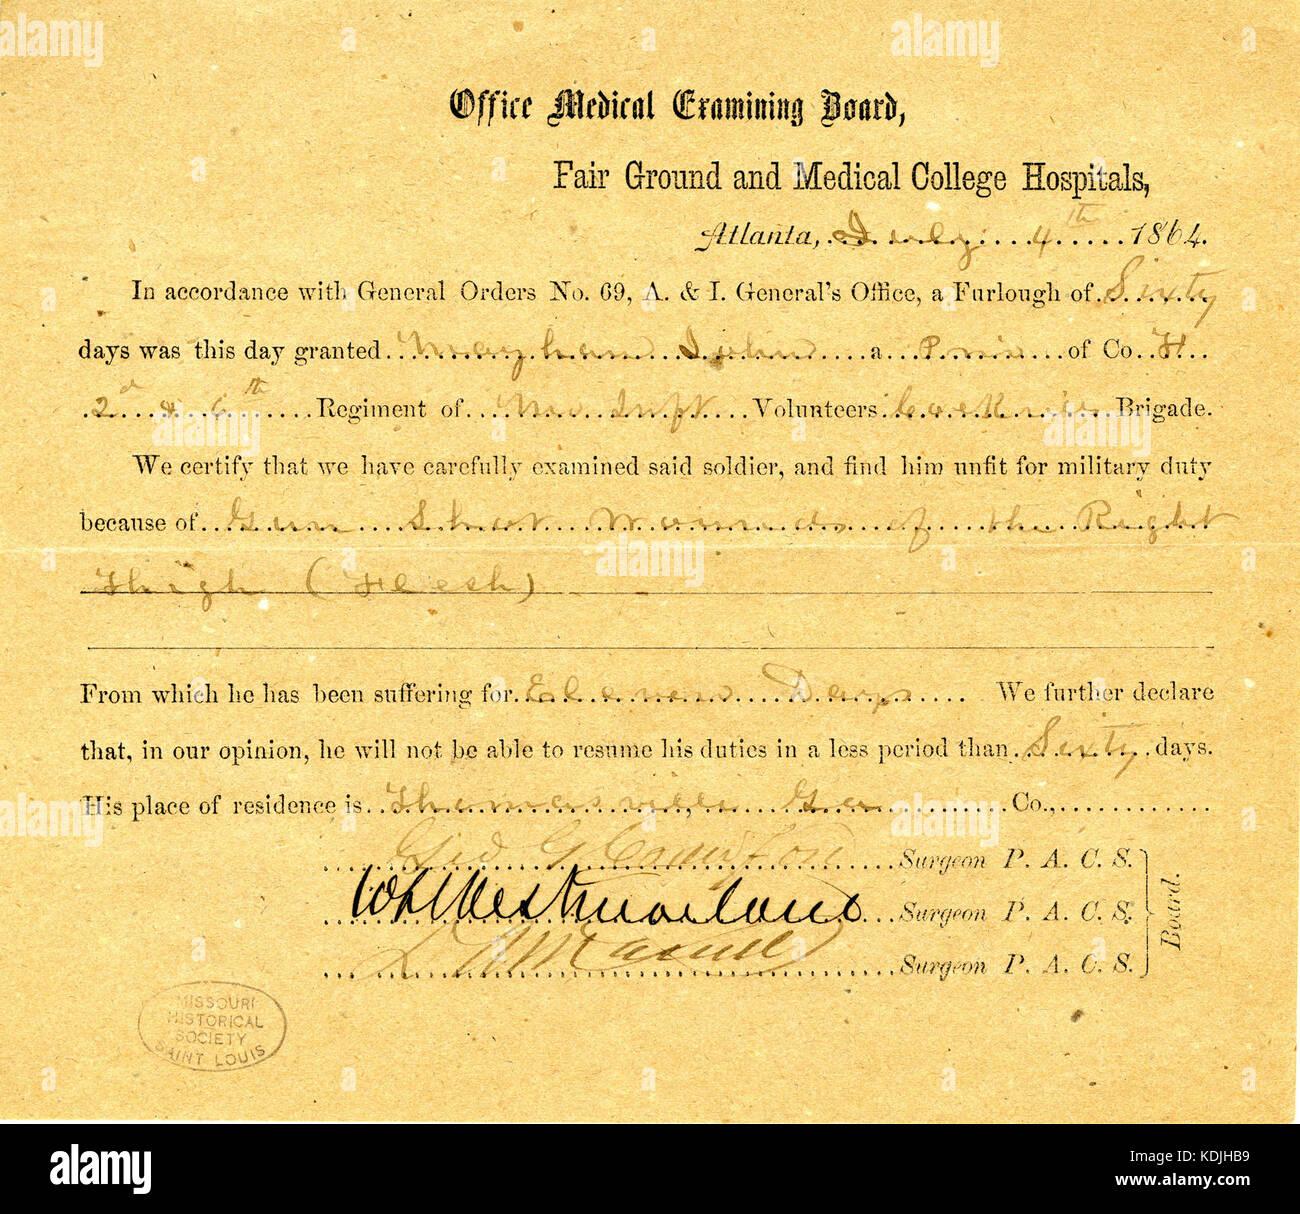 Medical certificate stock photos medical certificate stock medical certificate of john mayhan july 4 1864 stock image xflitez Gallery